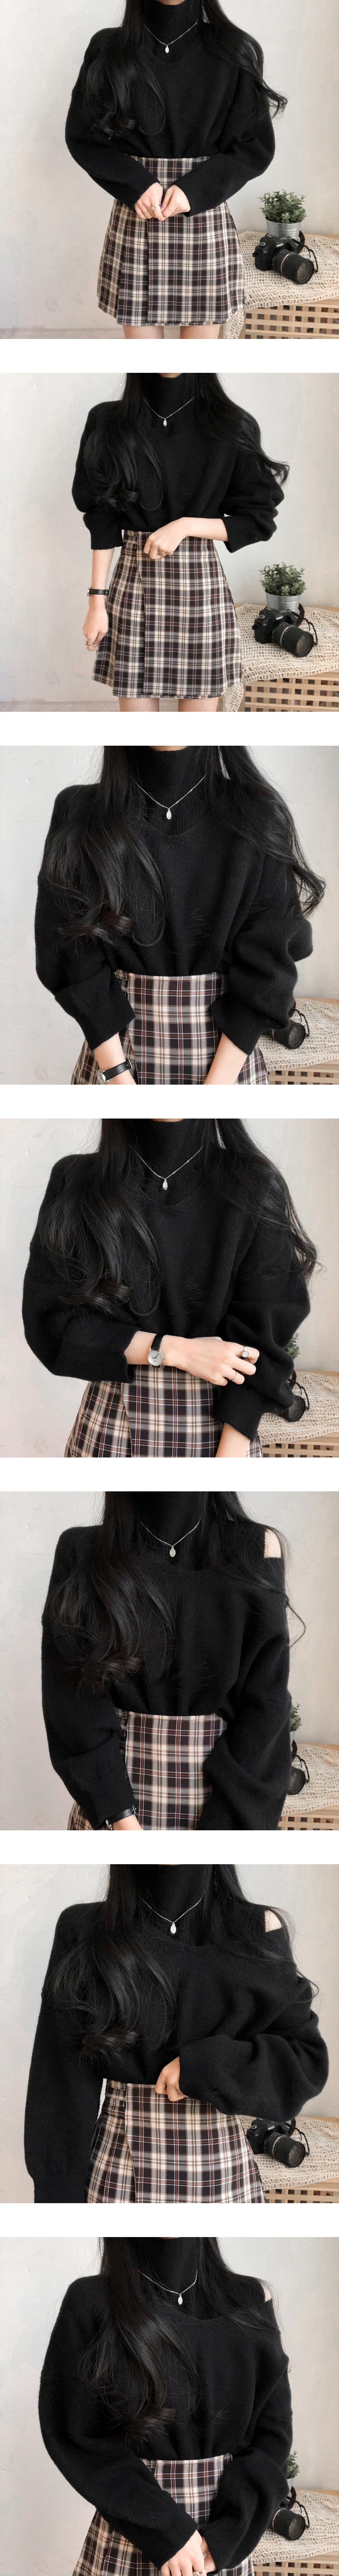 2-way detachable polar V-neck knit